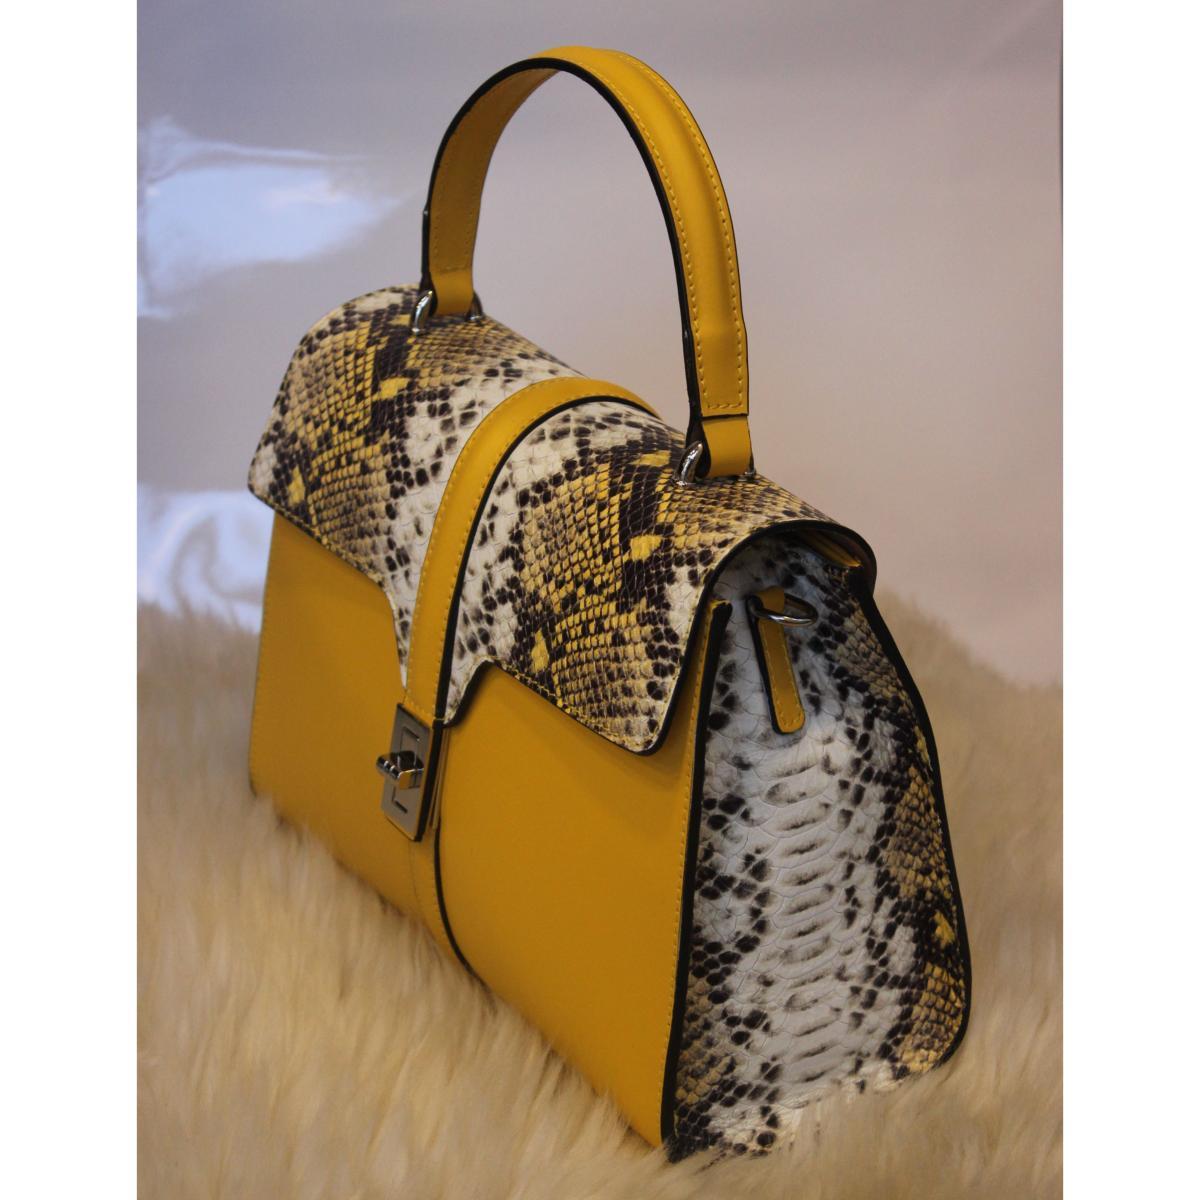 Angeli & Rebel's sac à main cuir véritable Athena jaune et python